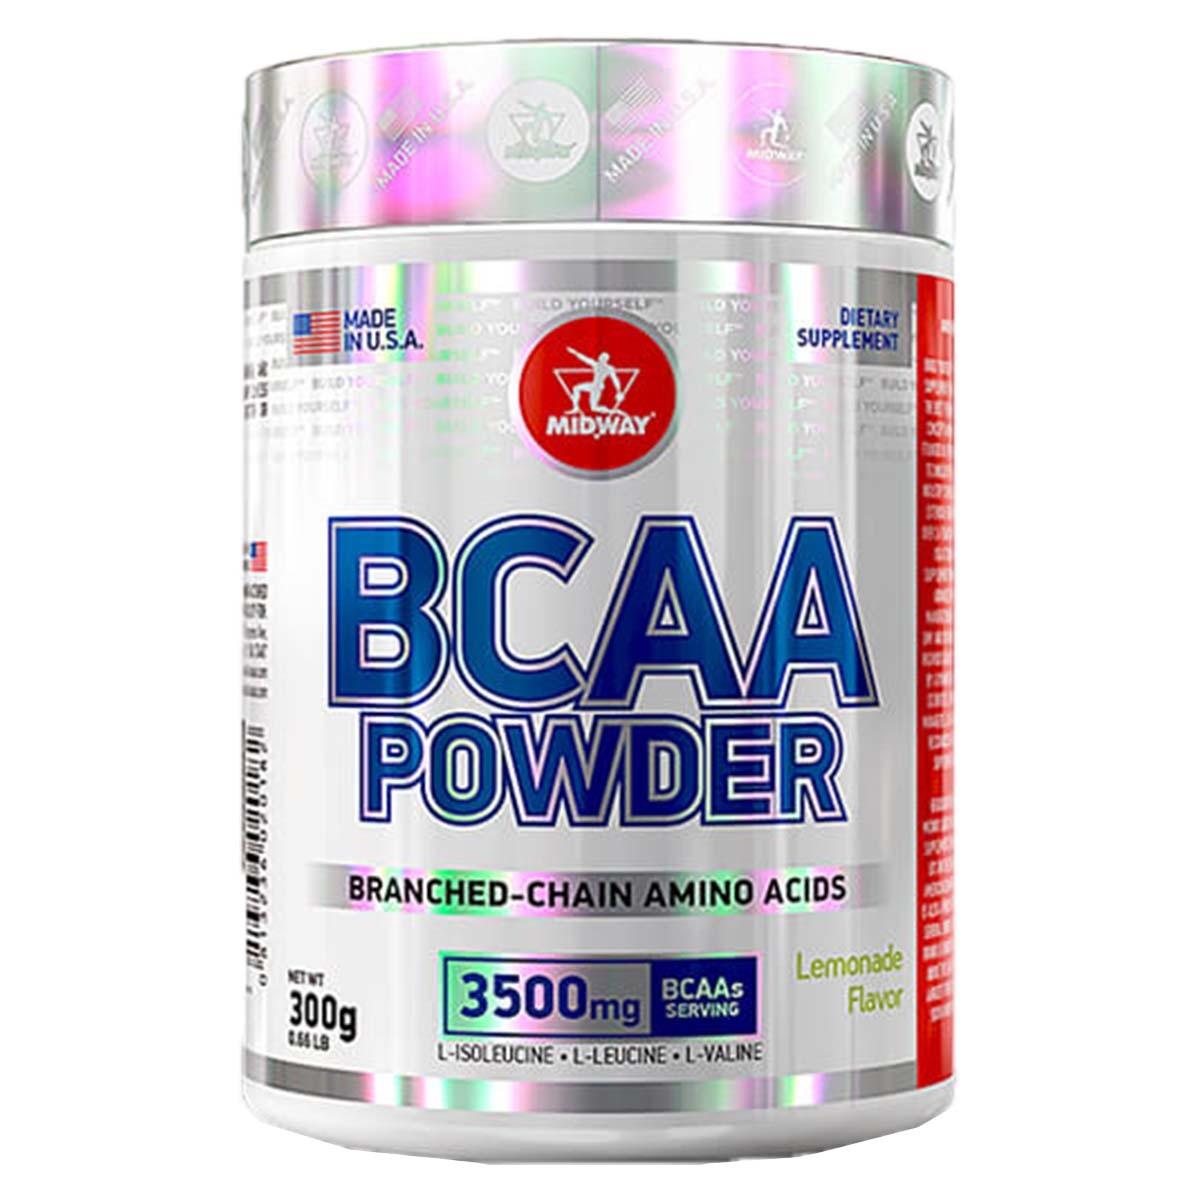 BCAA Powder 300g - Midway